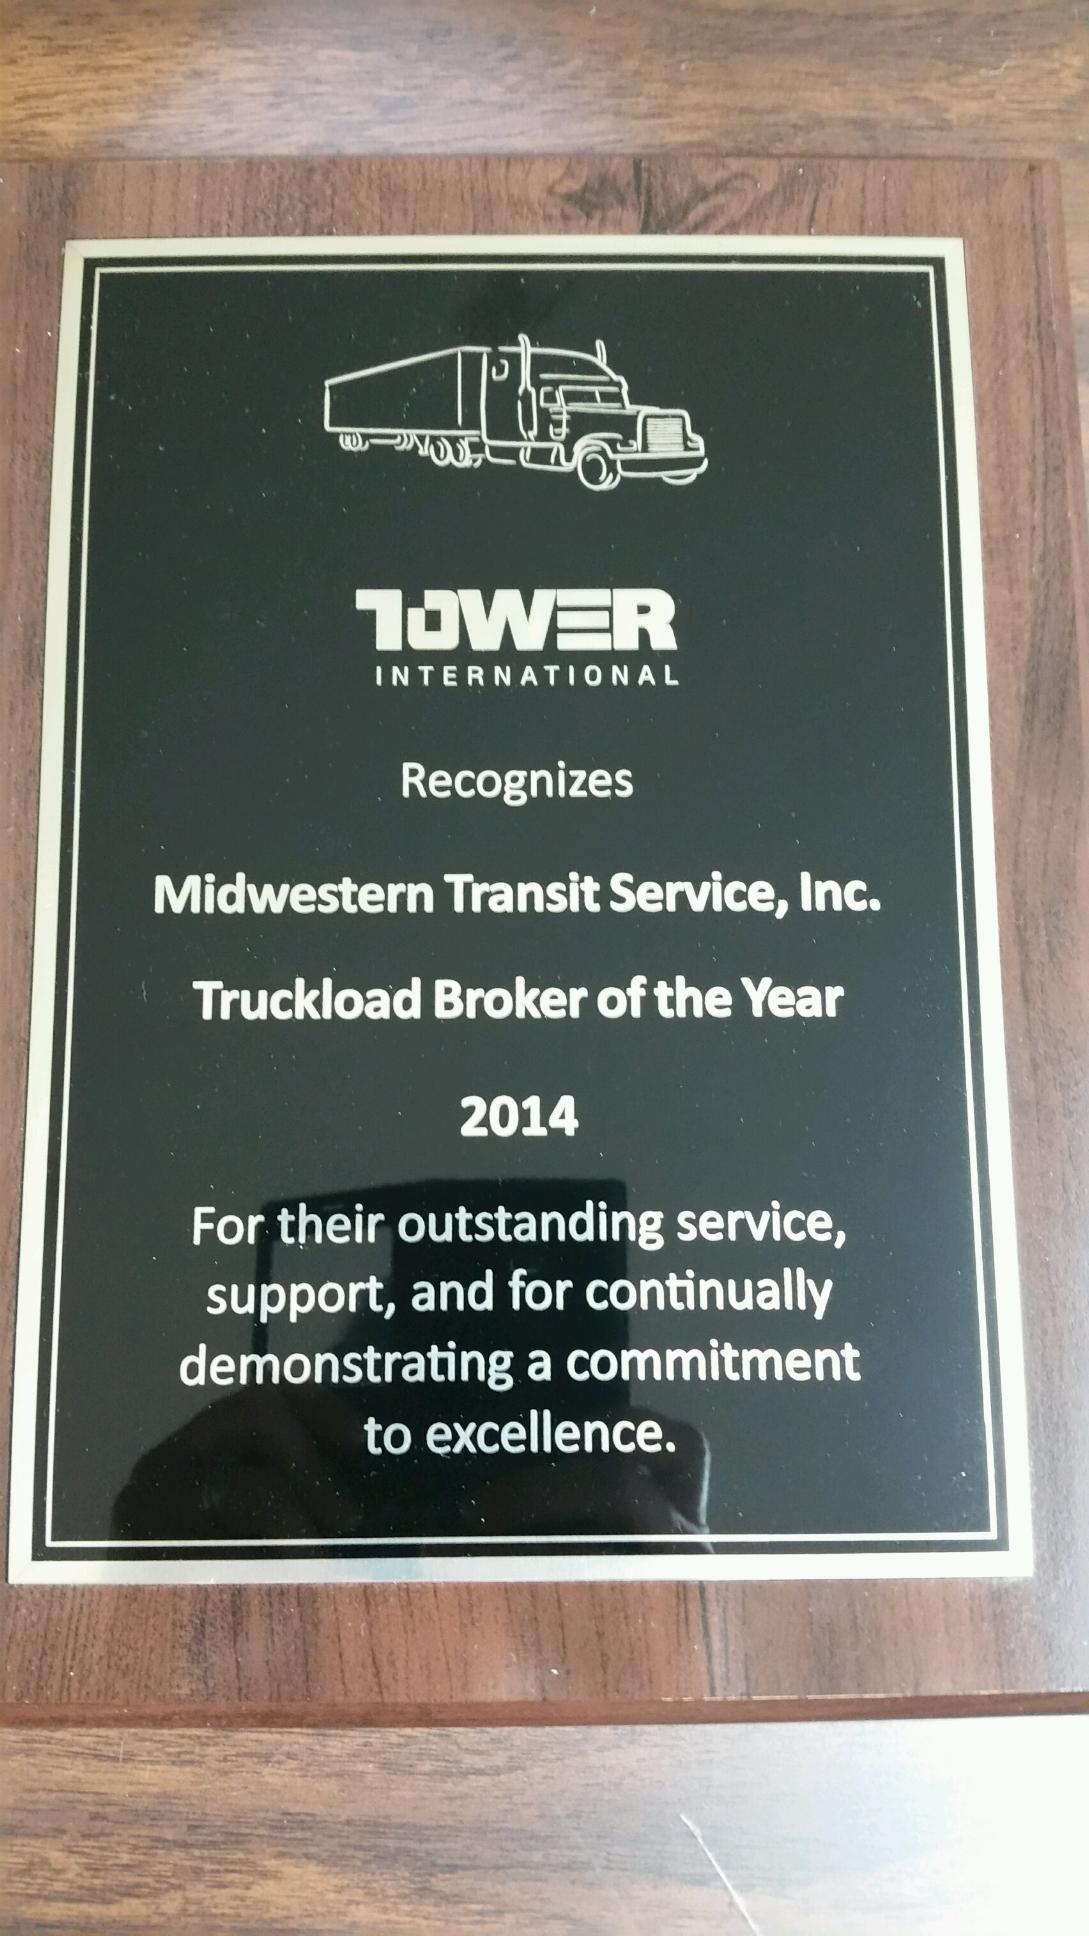 Tower 2014 Award